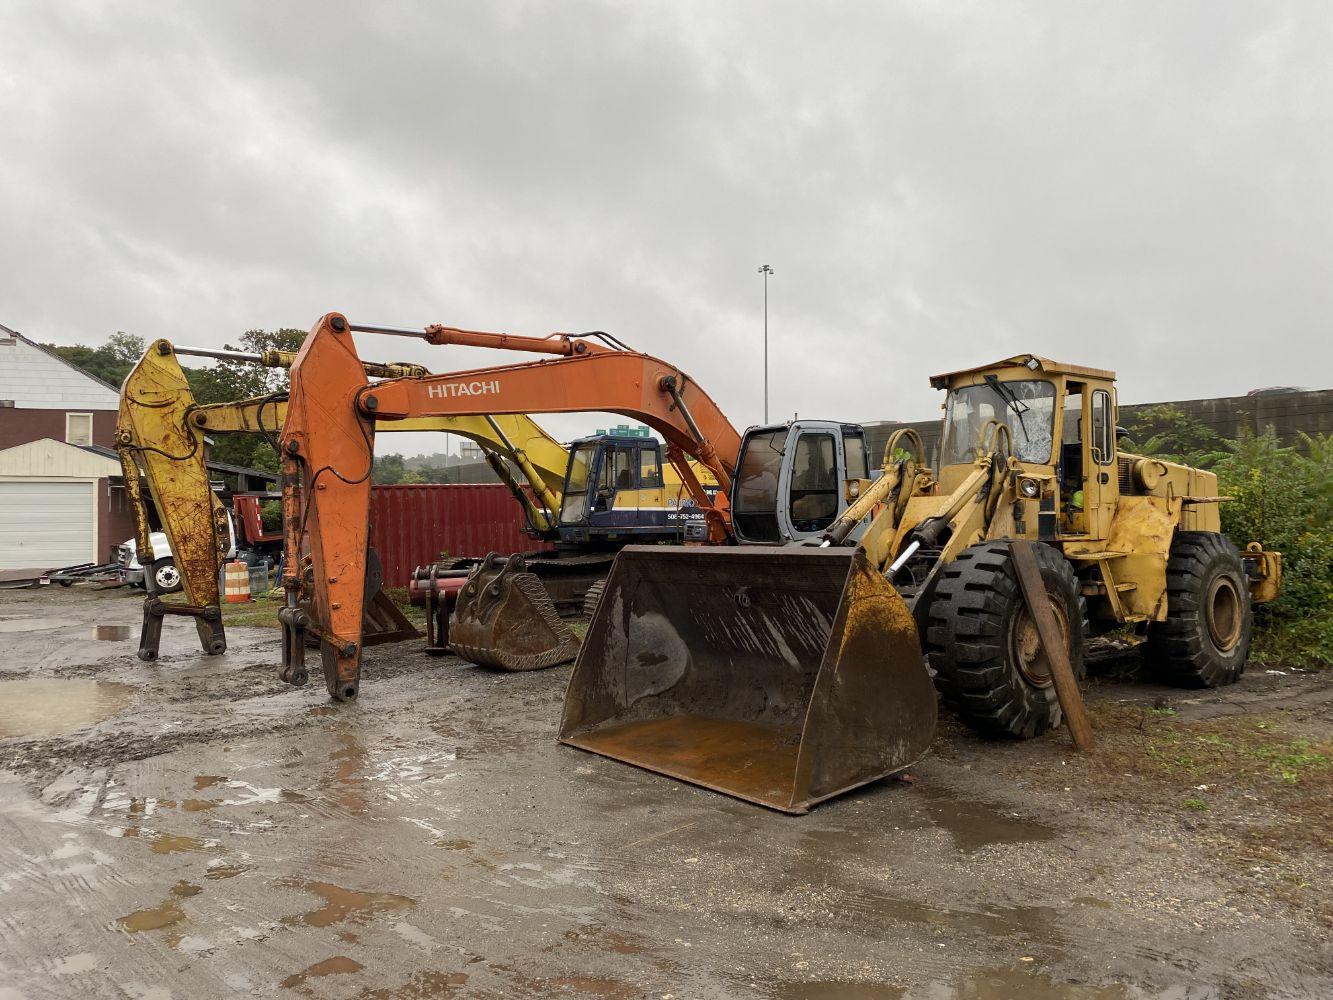 CONSTRUCTION - DEMOLITION - EXCAVATORS - LOADER - TRACTOR - TRAILER - PICKUPS